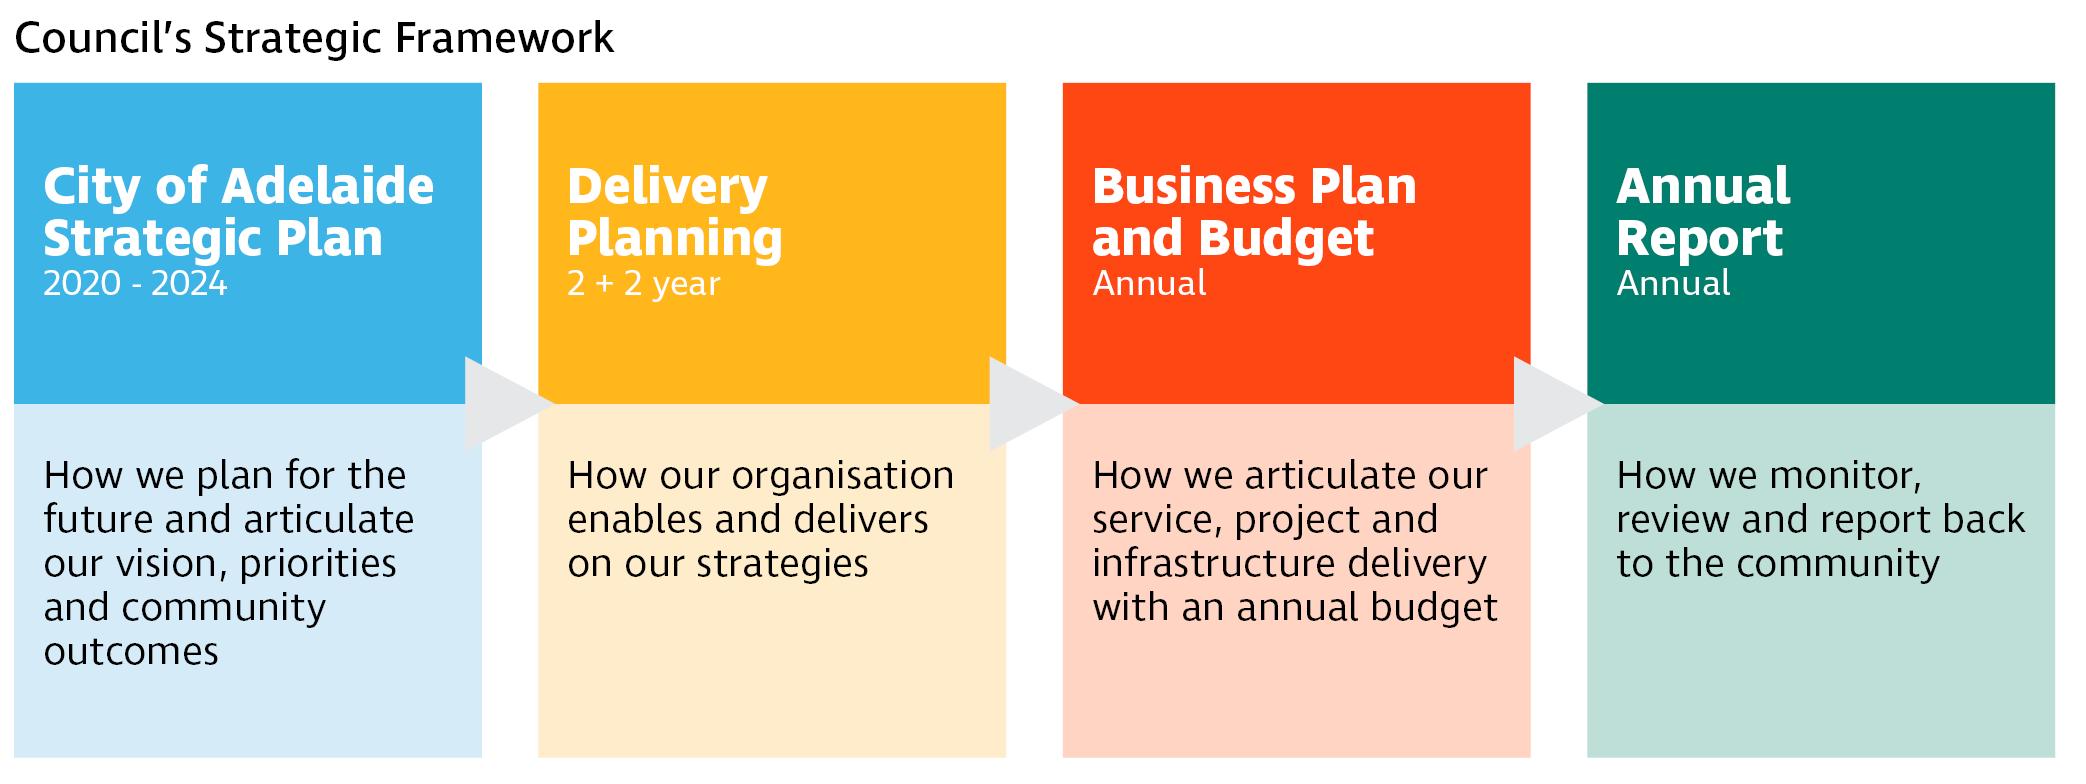 Bpab council strategic framework